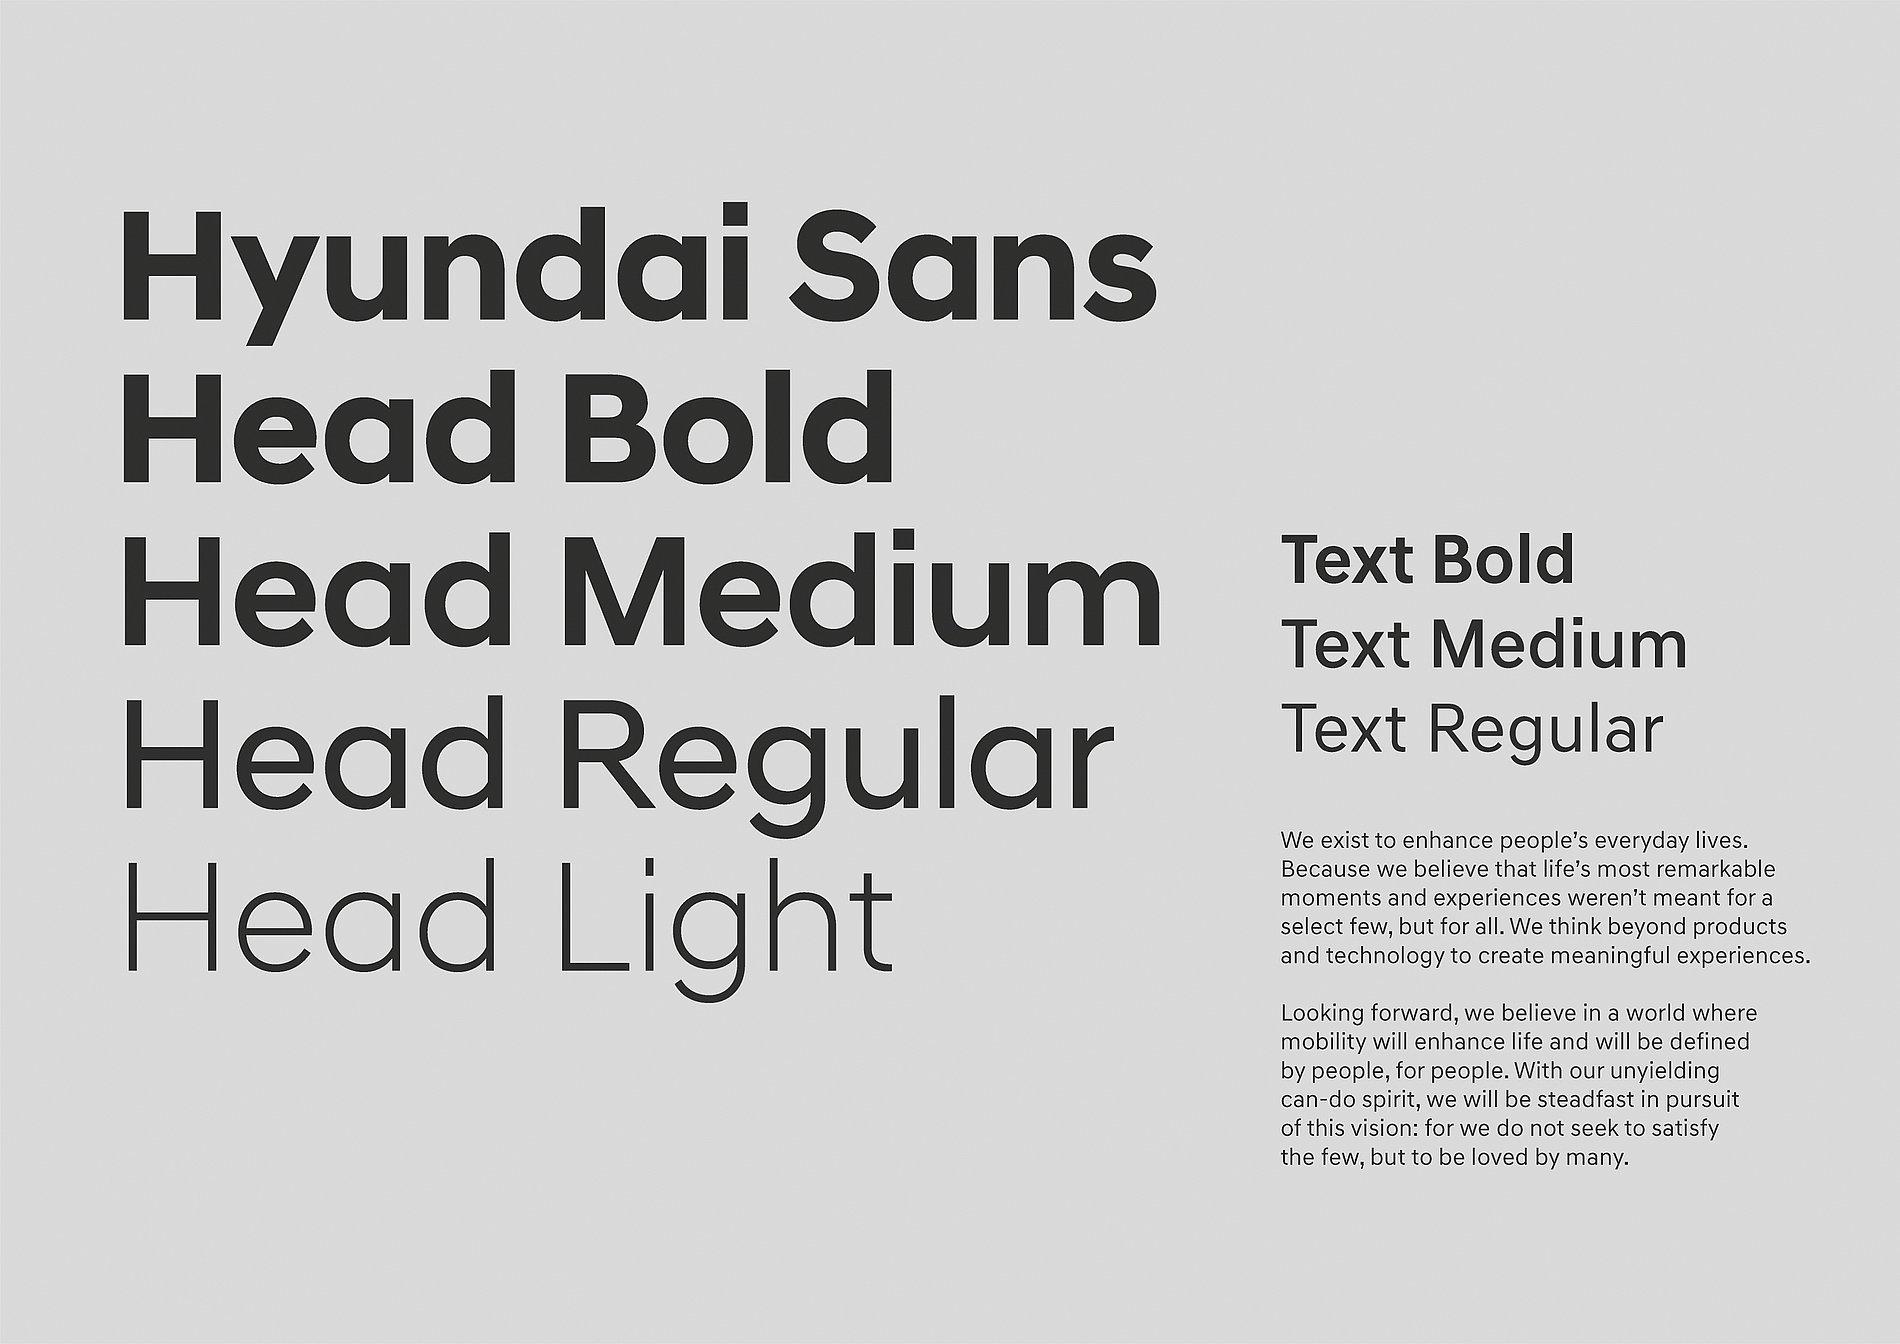 Hyundai Sans | Red Dot Design Award